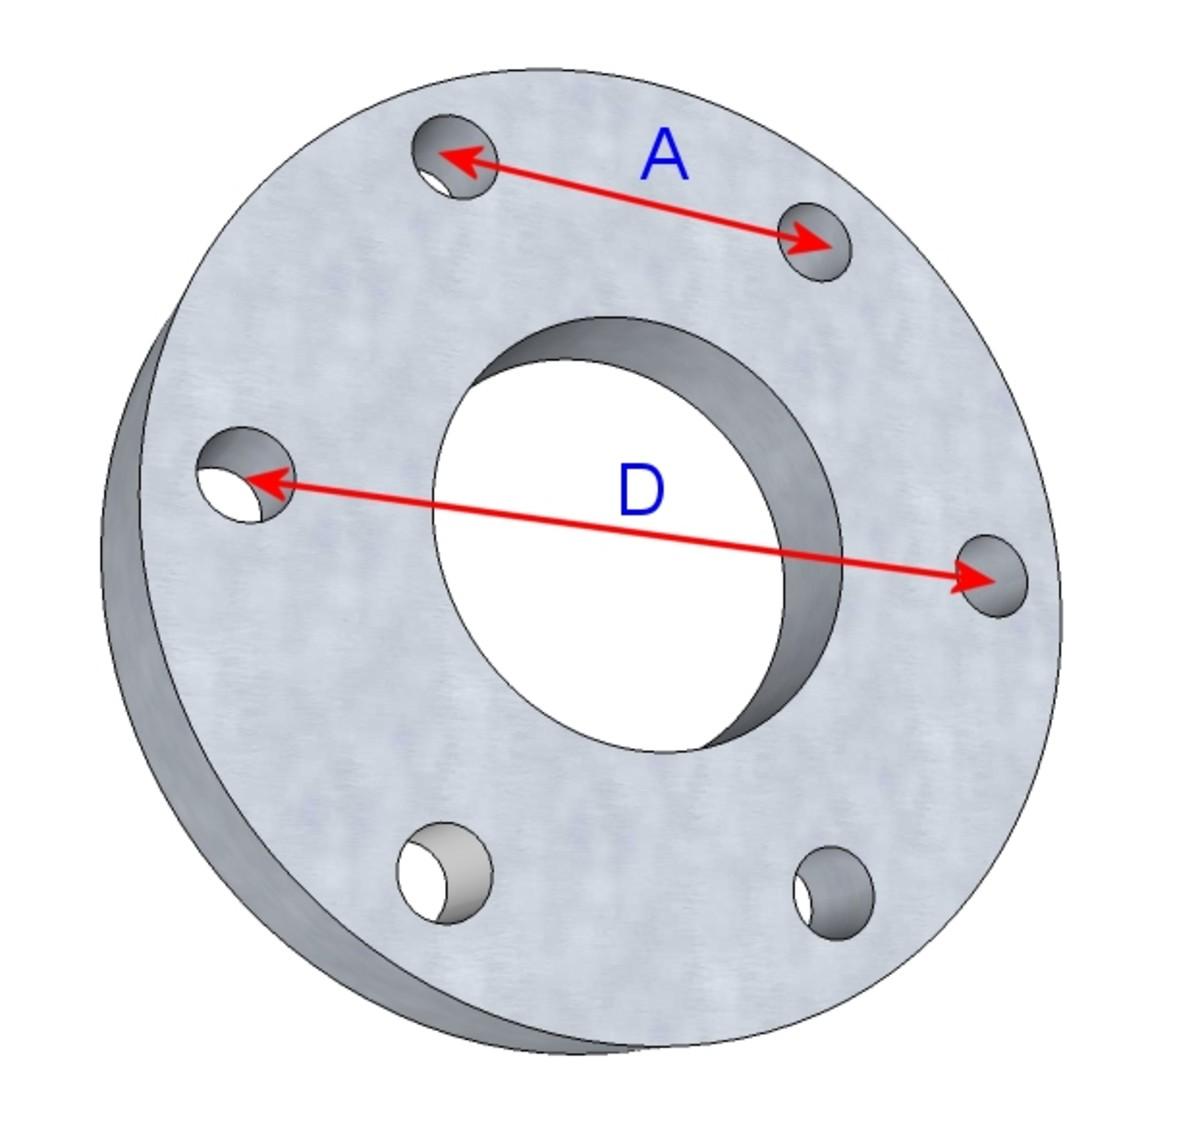 Bolt circle diameter (BCD)